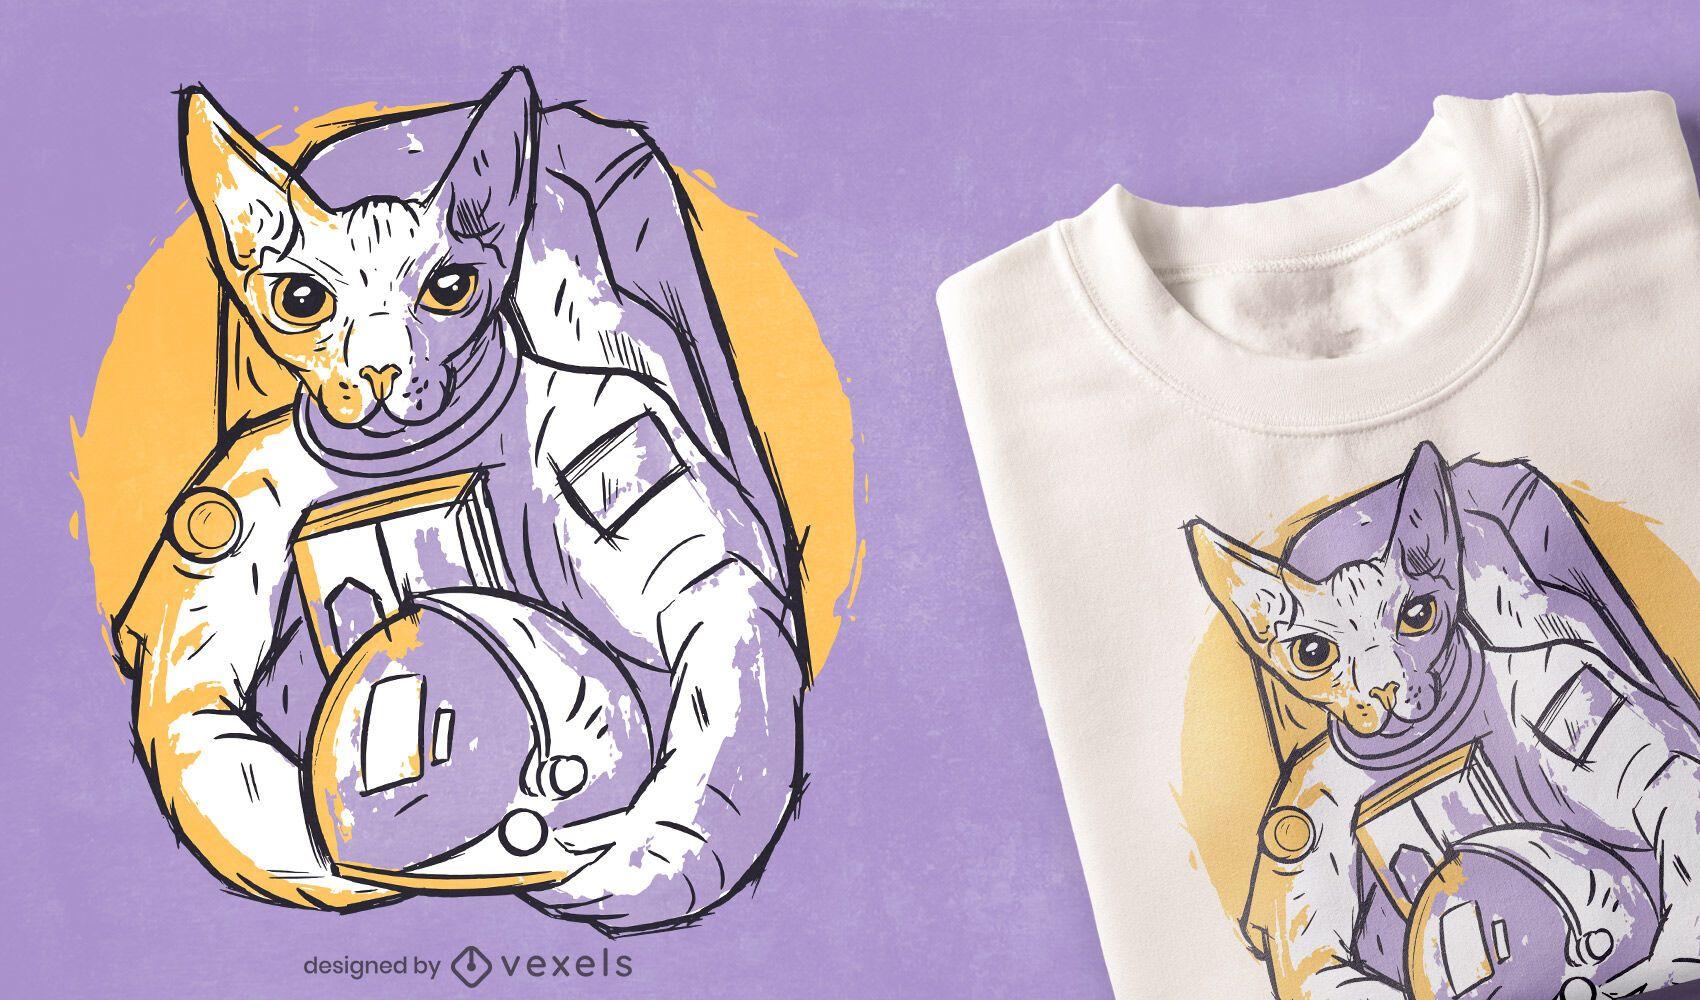 Astronaut cat hand-drawn t-shirt design